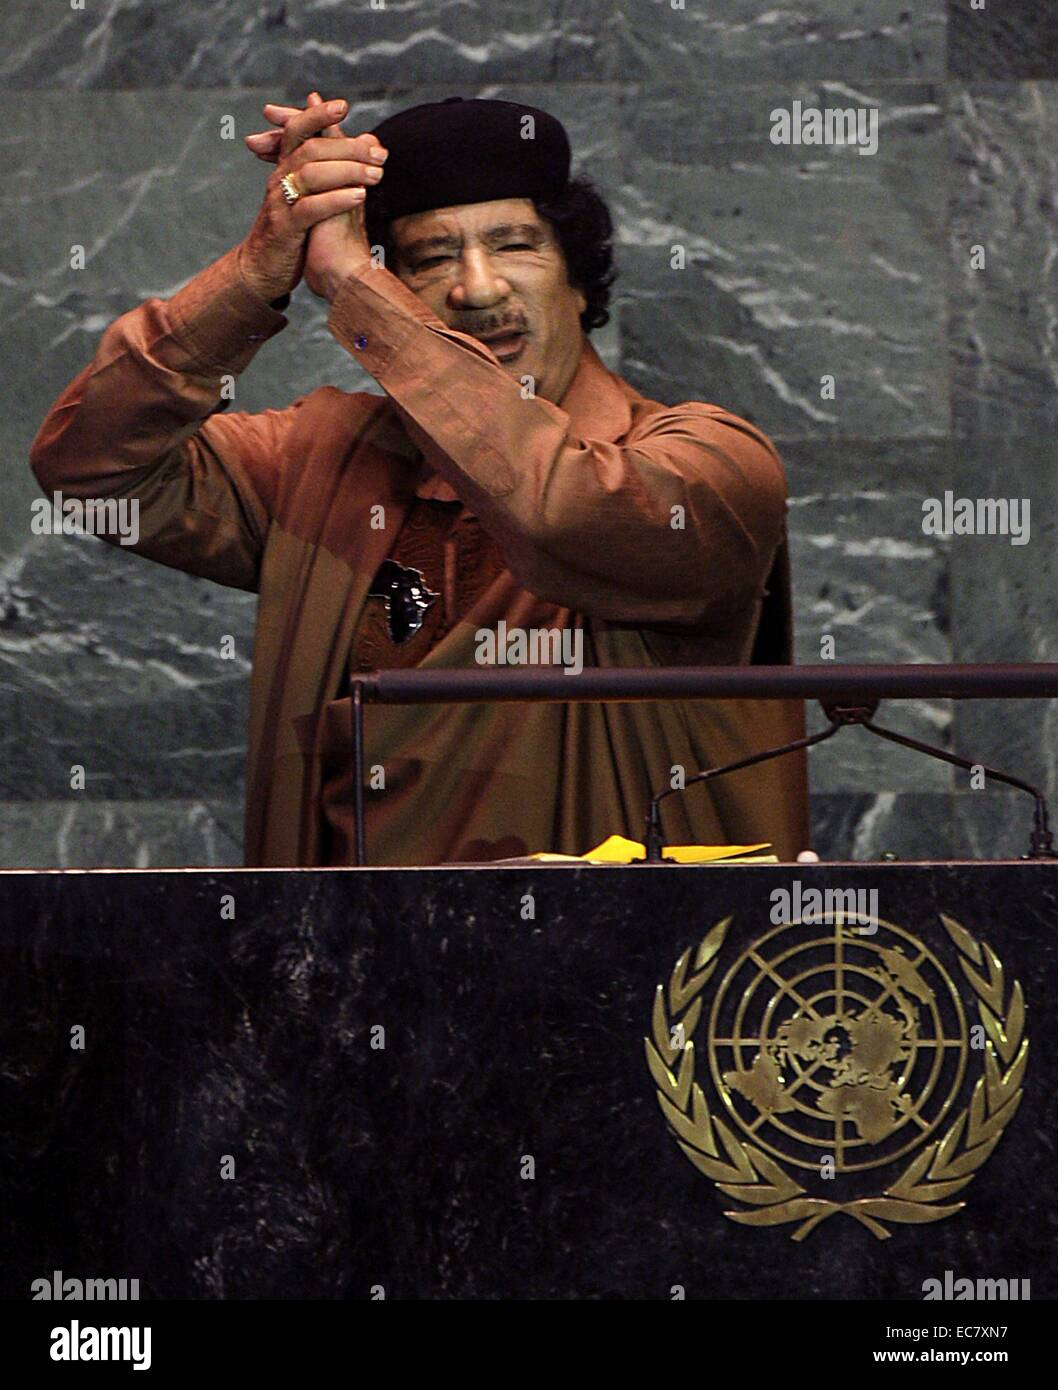 Muammar Gaddafi;    Libyan ruler  Addressing the UN General Assembly 2009 - Stock Image